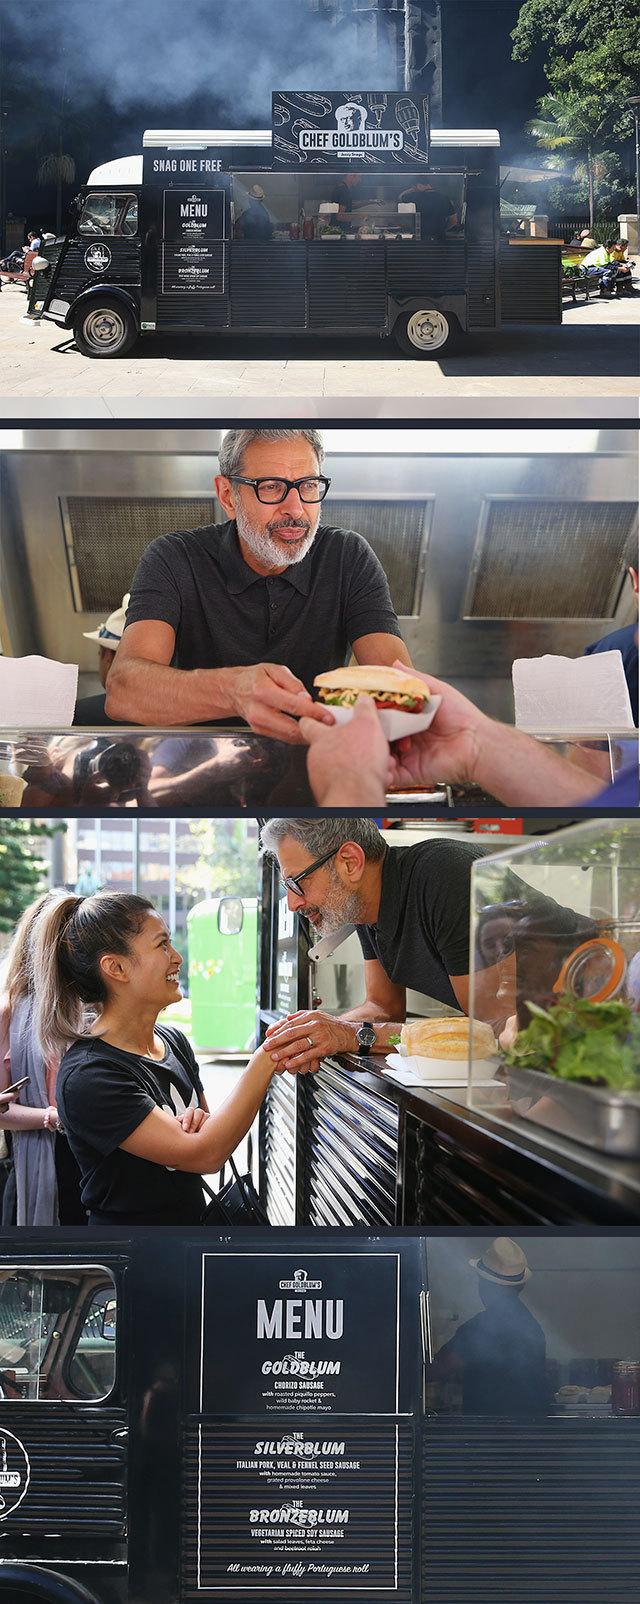 Chef Goldblum's - meme